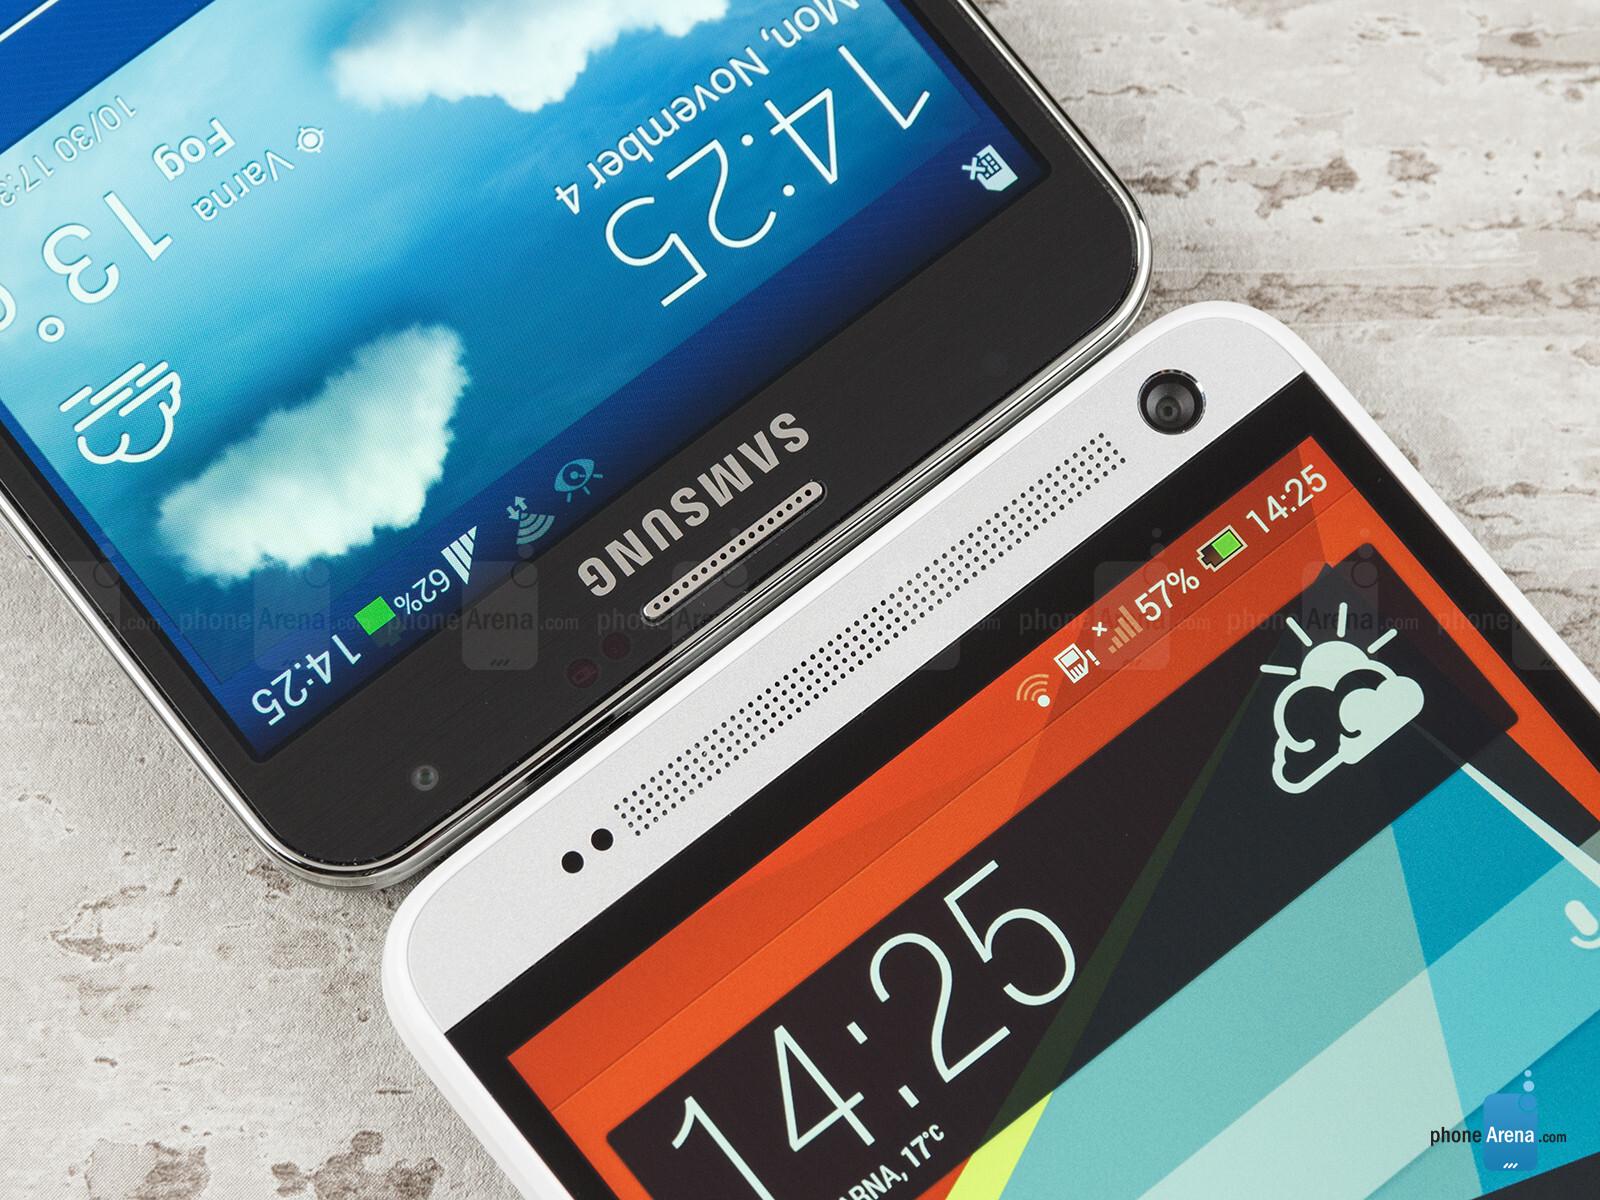 Htc One Max vs Samsung Galaxy